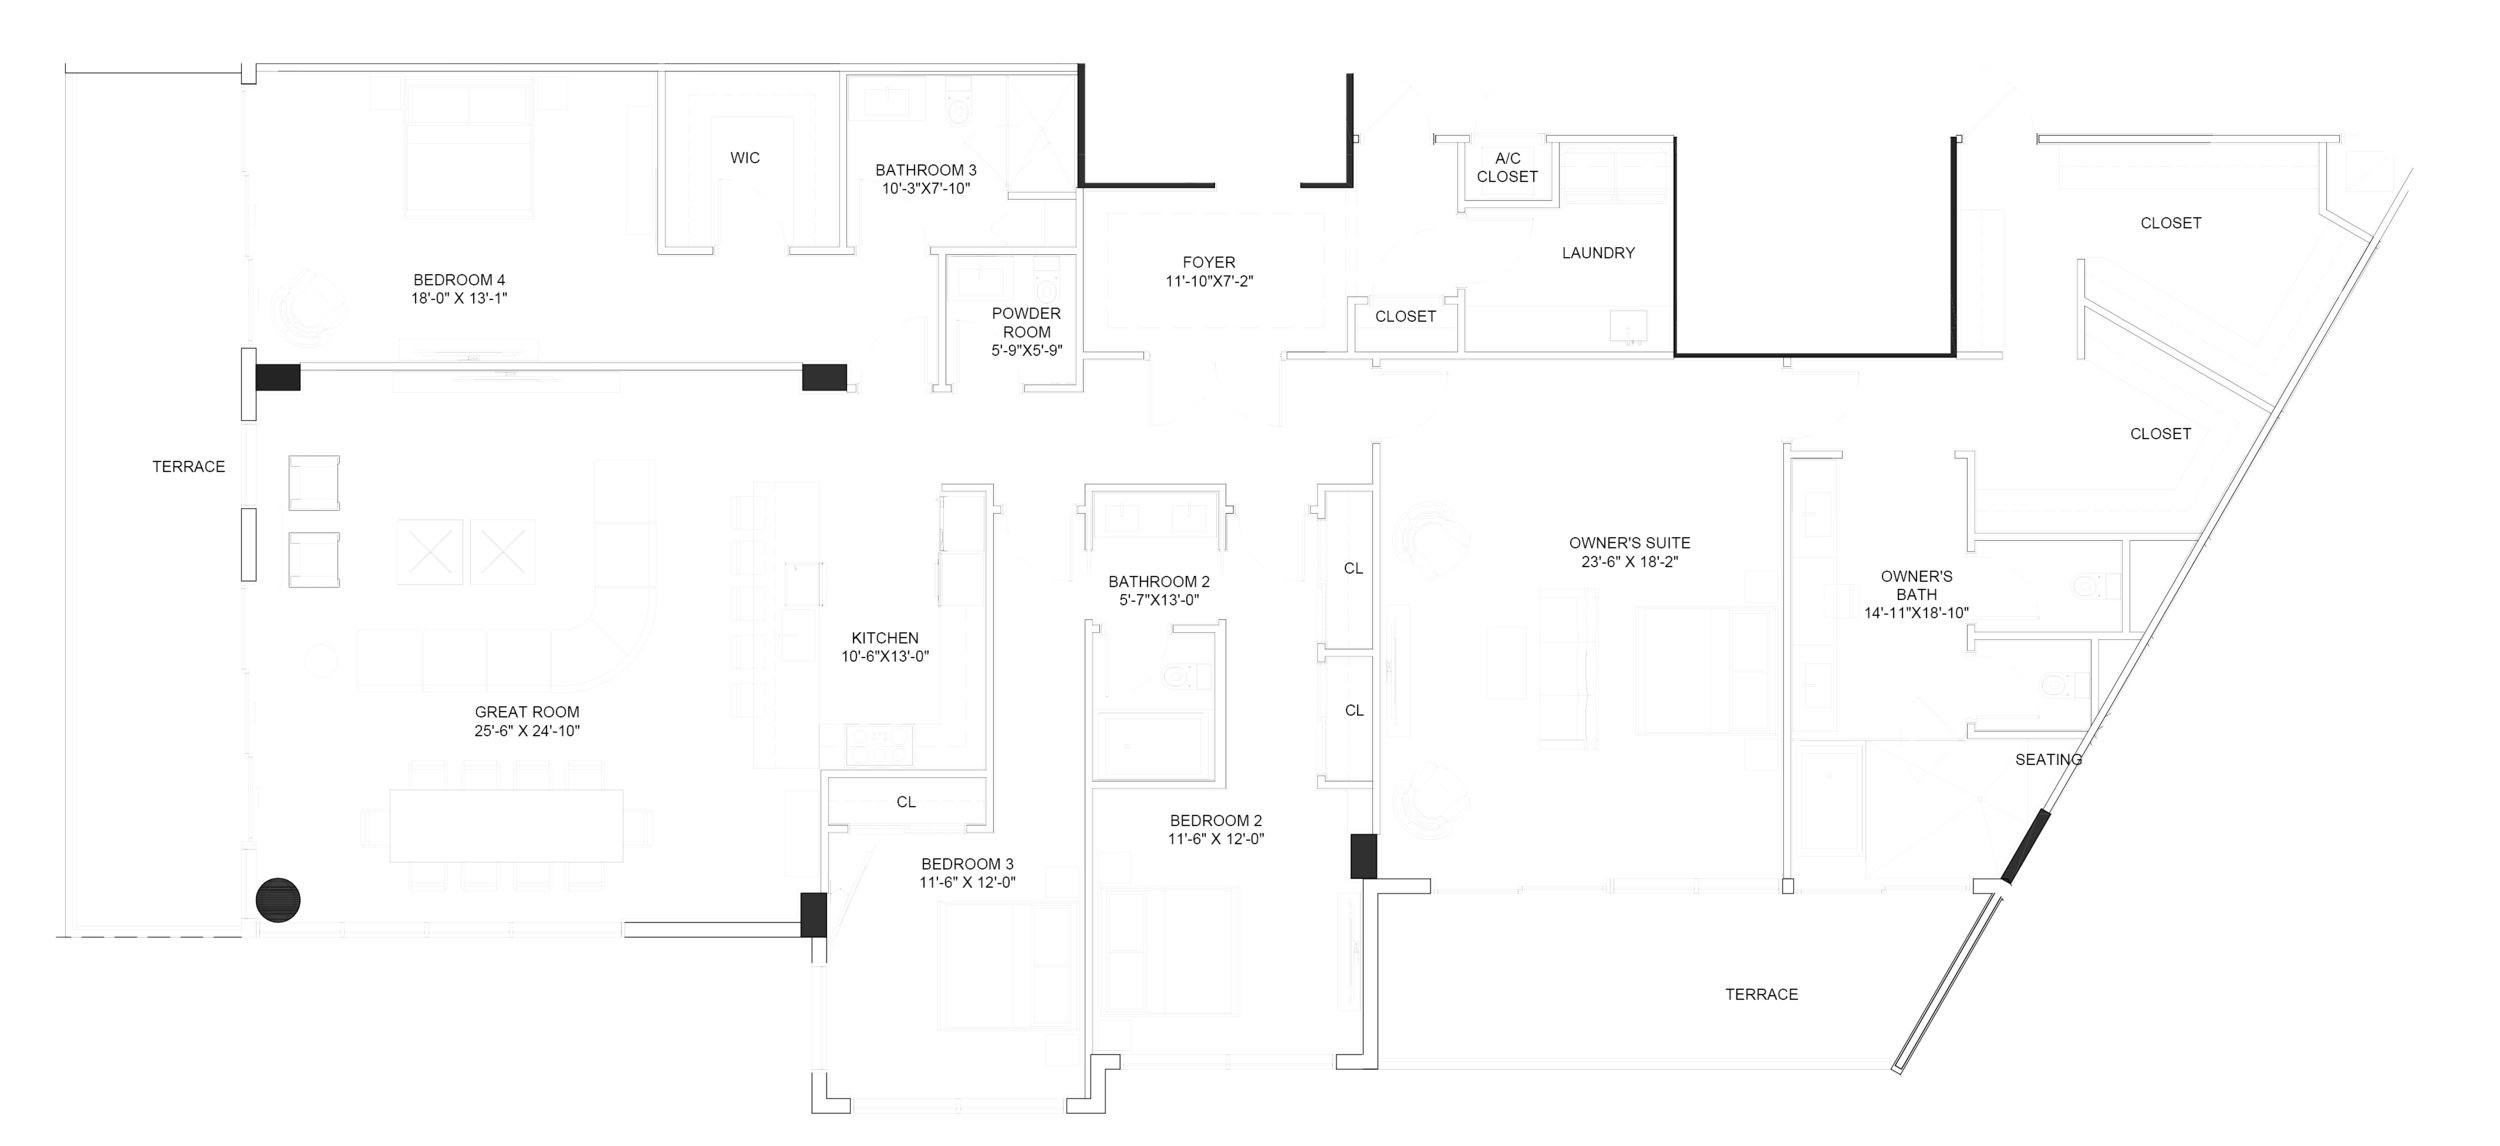 Penthouse D 4-4.5 3828 sf.jpg